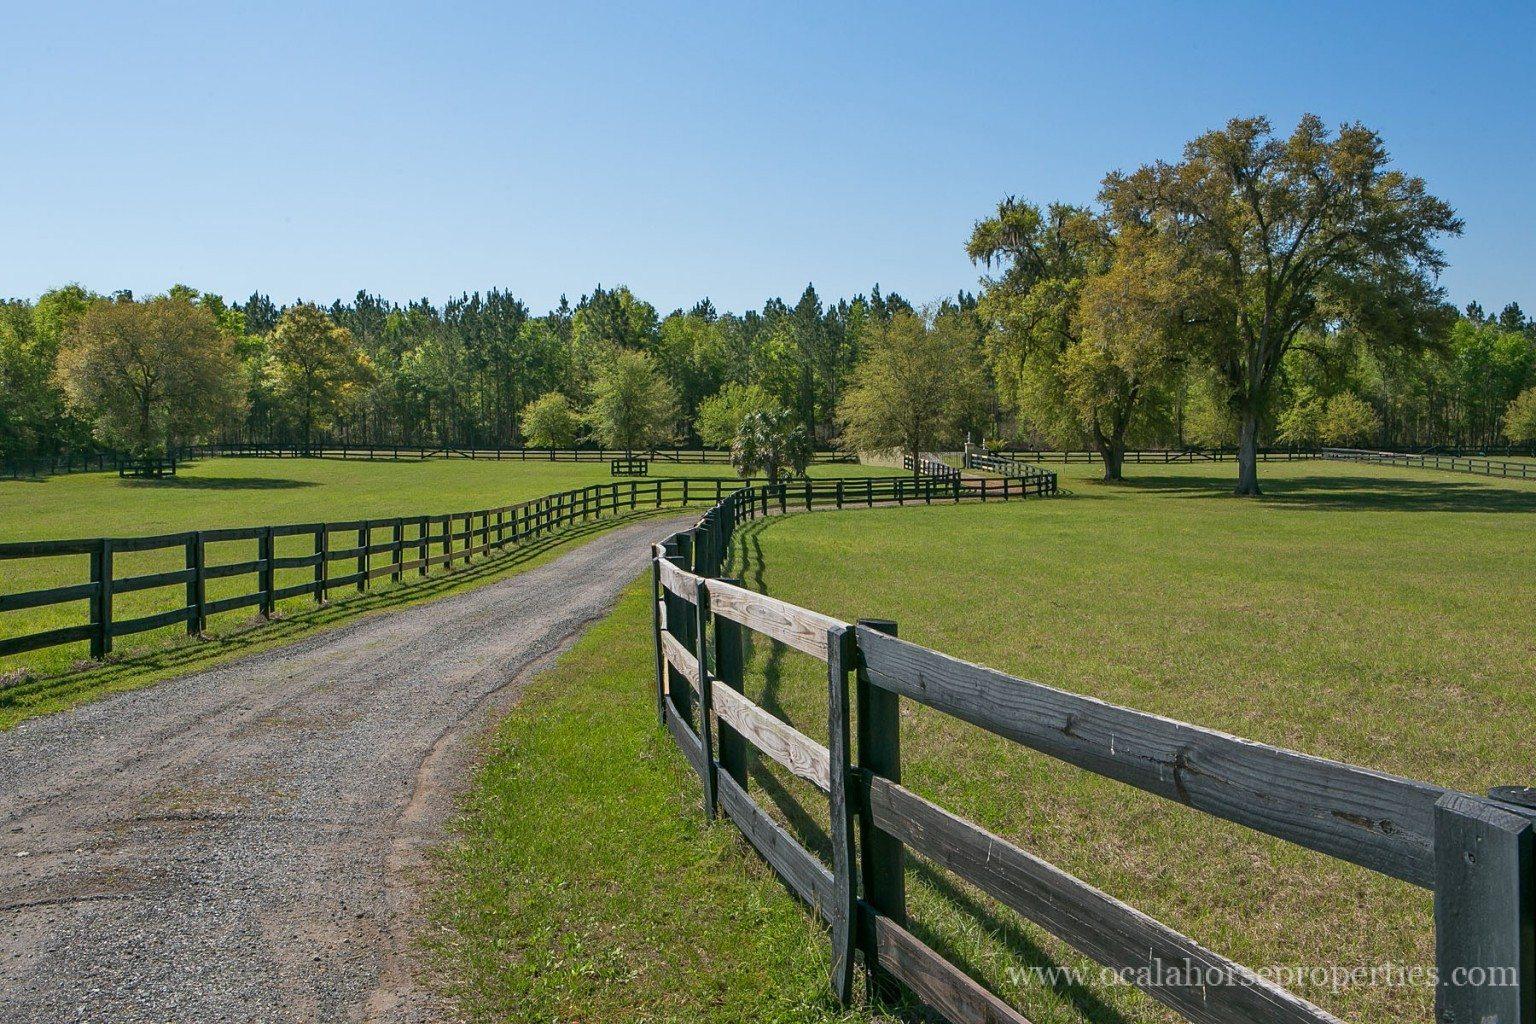 Grandview ranch ocala horse farm for sale ocala horse for Horse farm